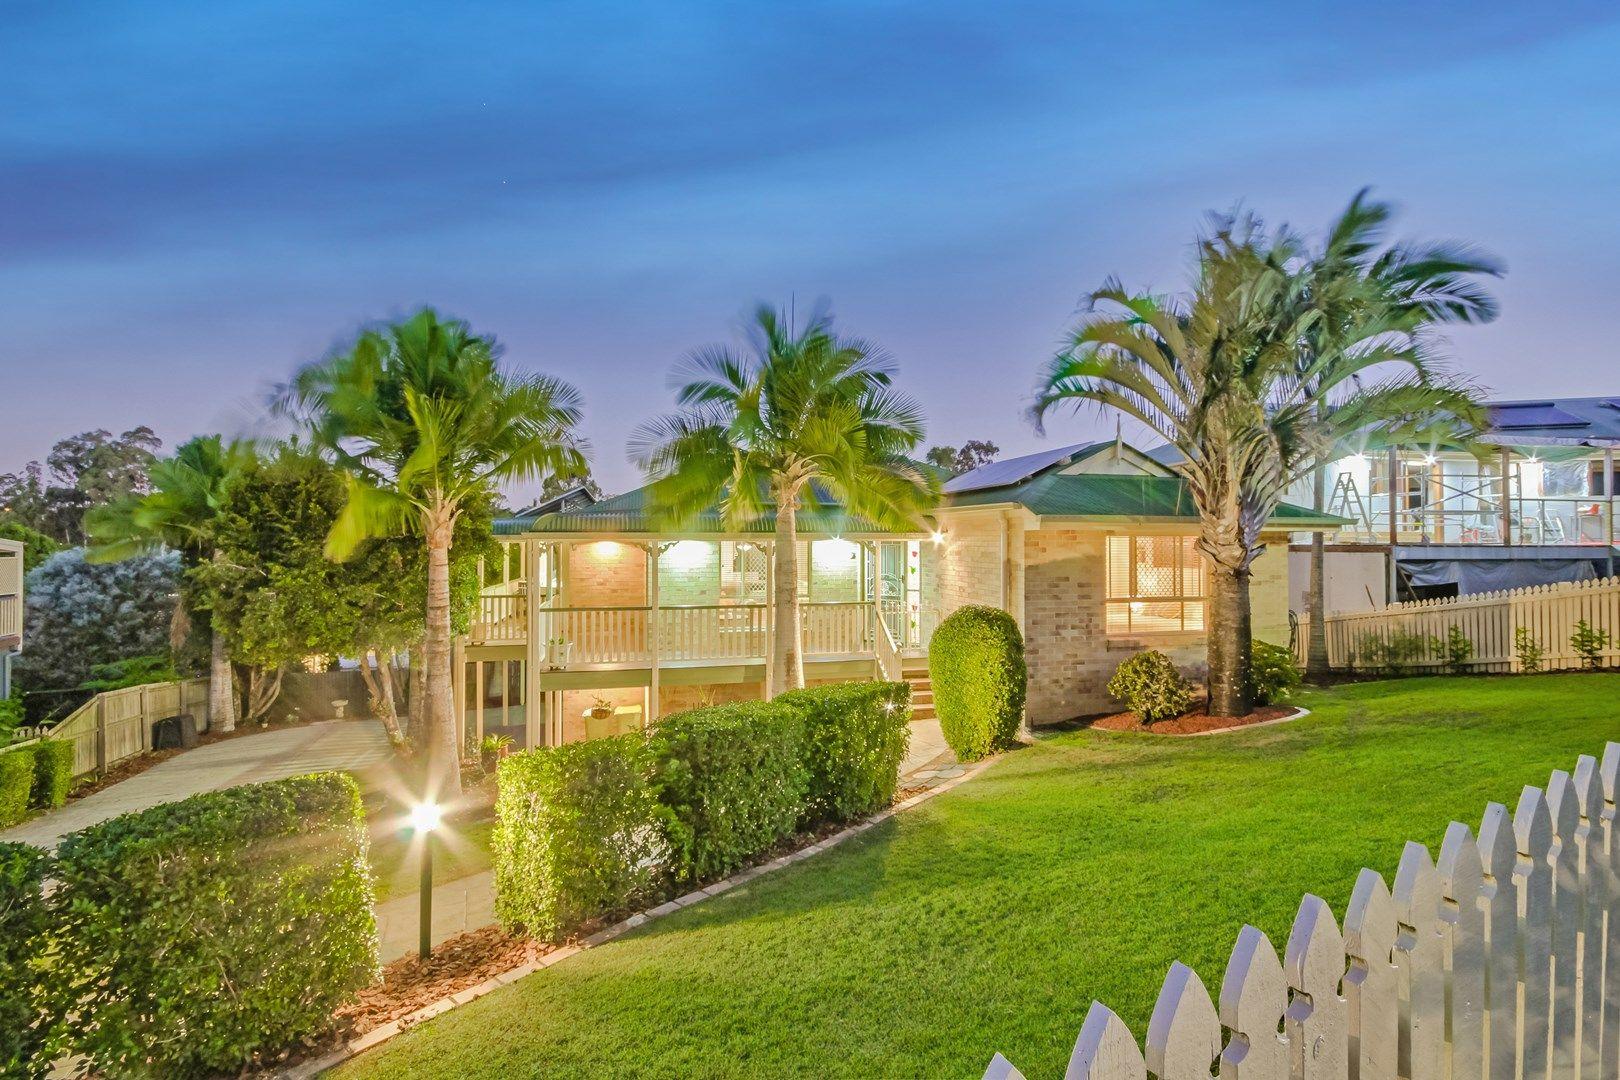 39 Hillenvale Avenue, Arana Hills QLD 4054, Image 0